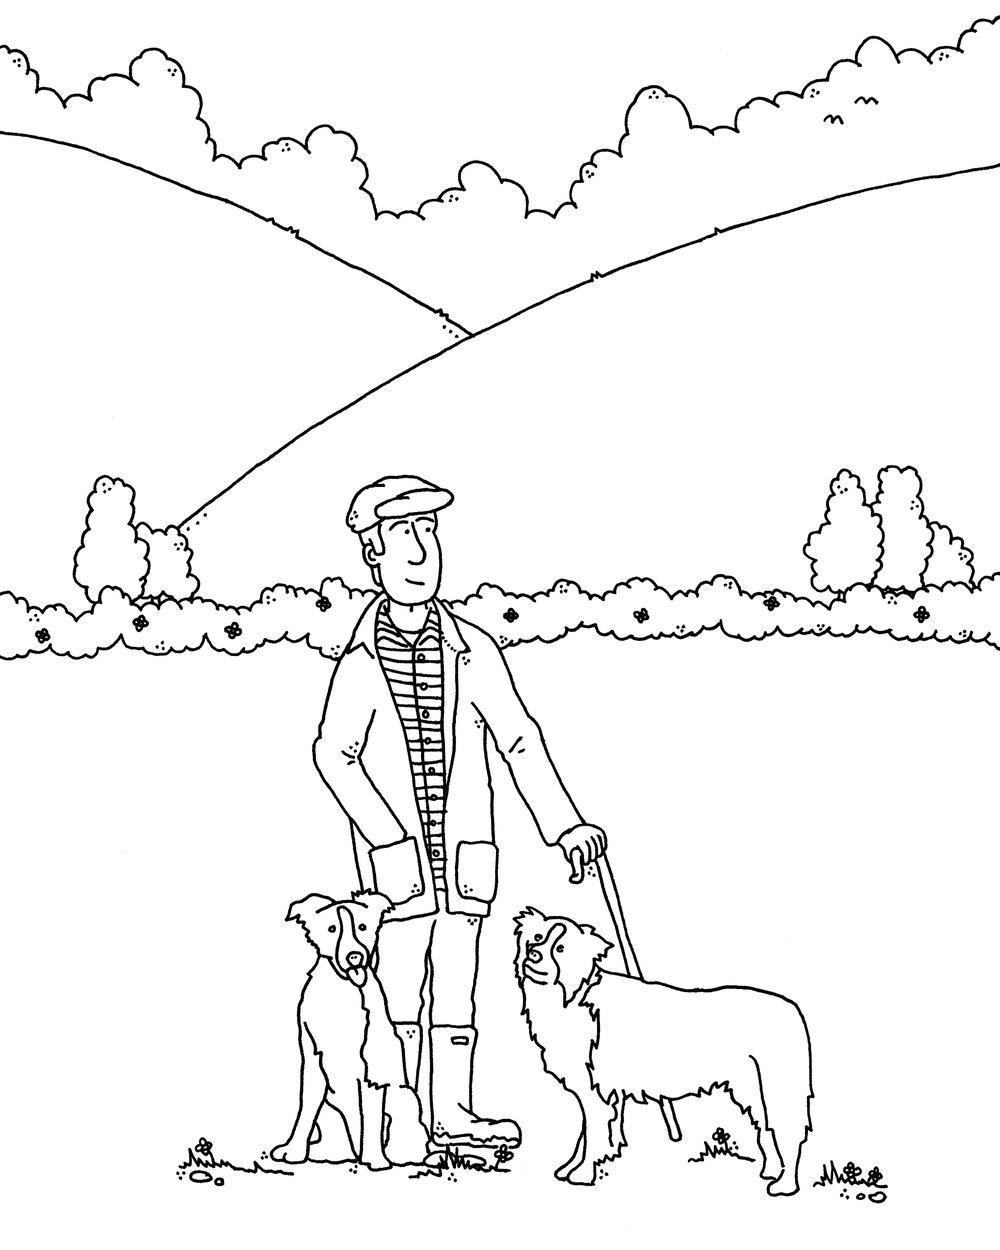 Sheepdogs cartoon by Sid Wright sidwright.co.uk